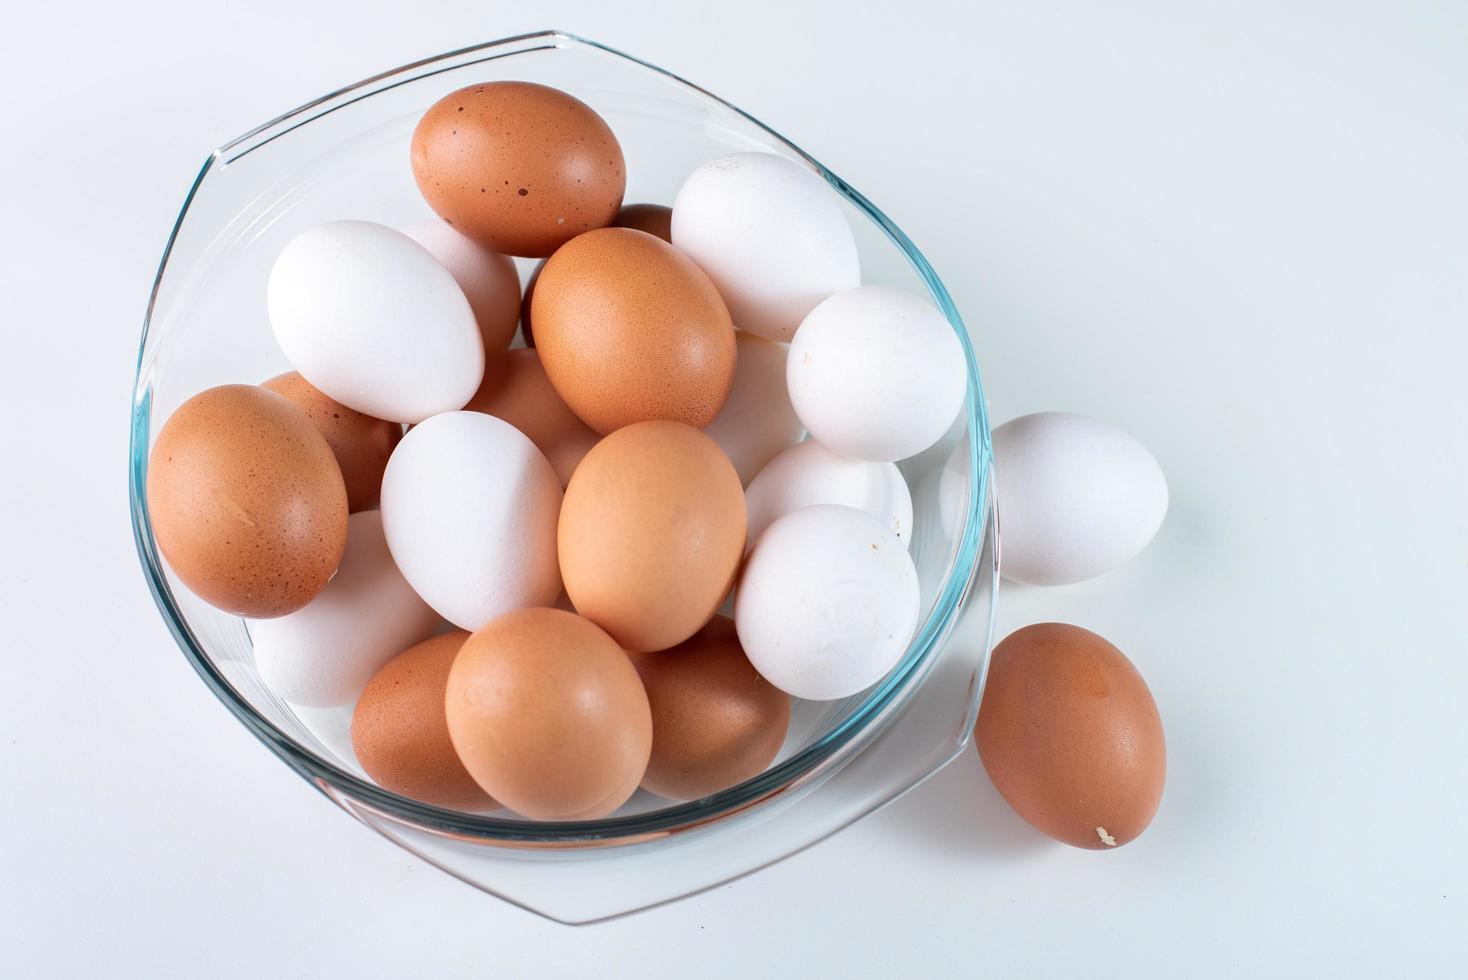 Schüssel Eier foto